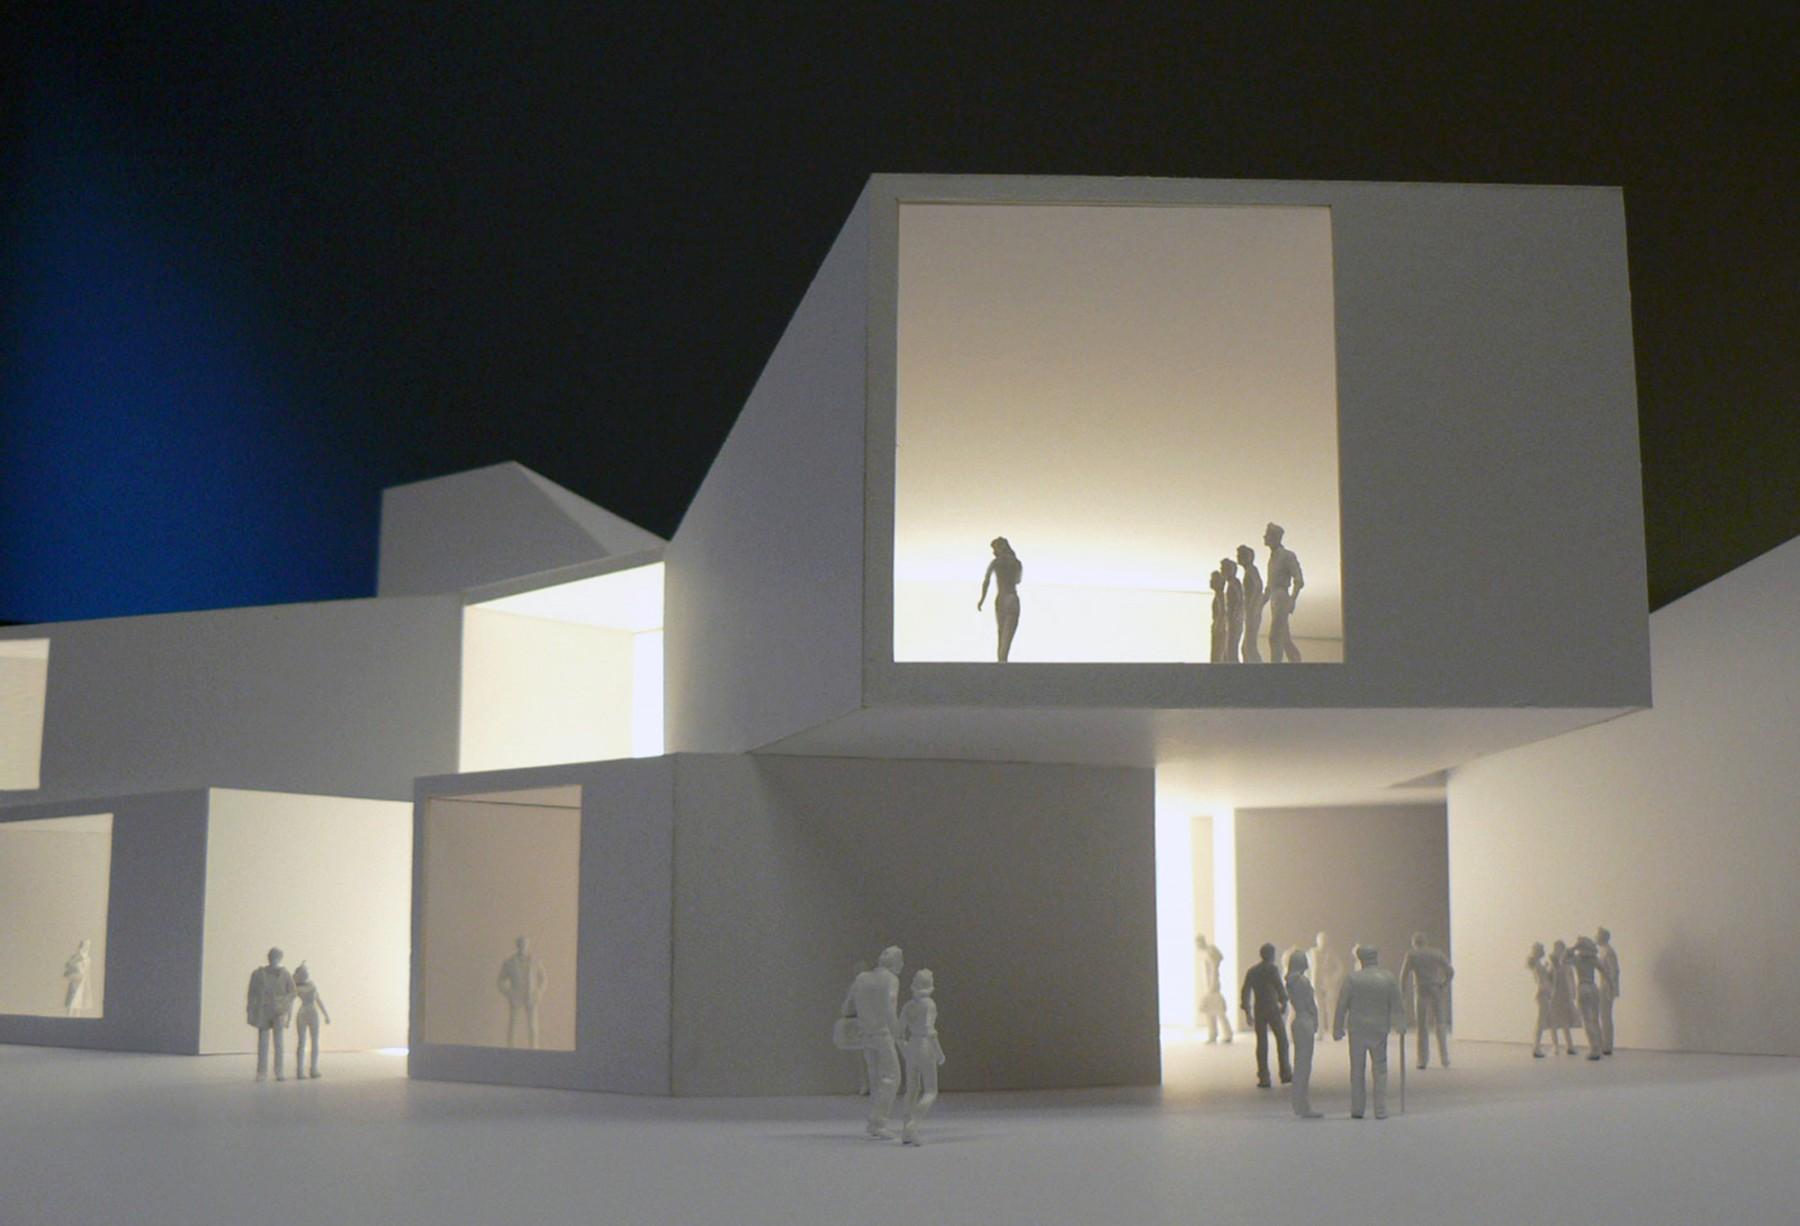 University-Bath-Creative-Arts-Centre-short-list-education-somerset-campus-theatre-Jamie-Fobert-architects-model